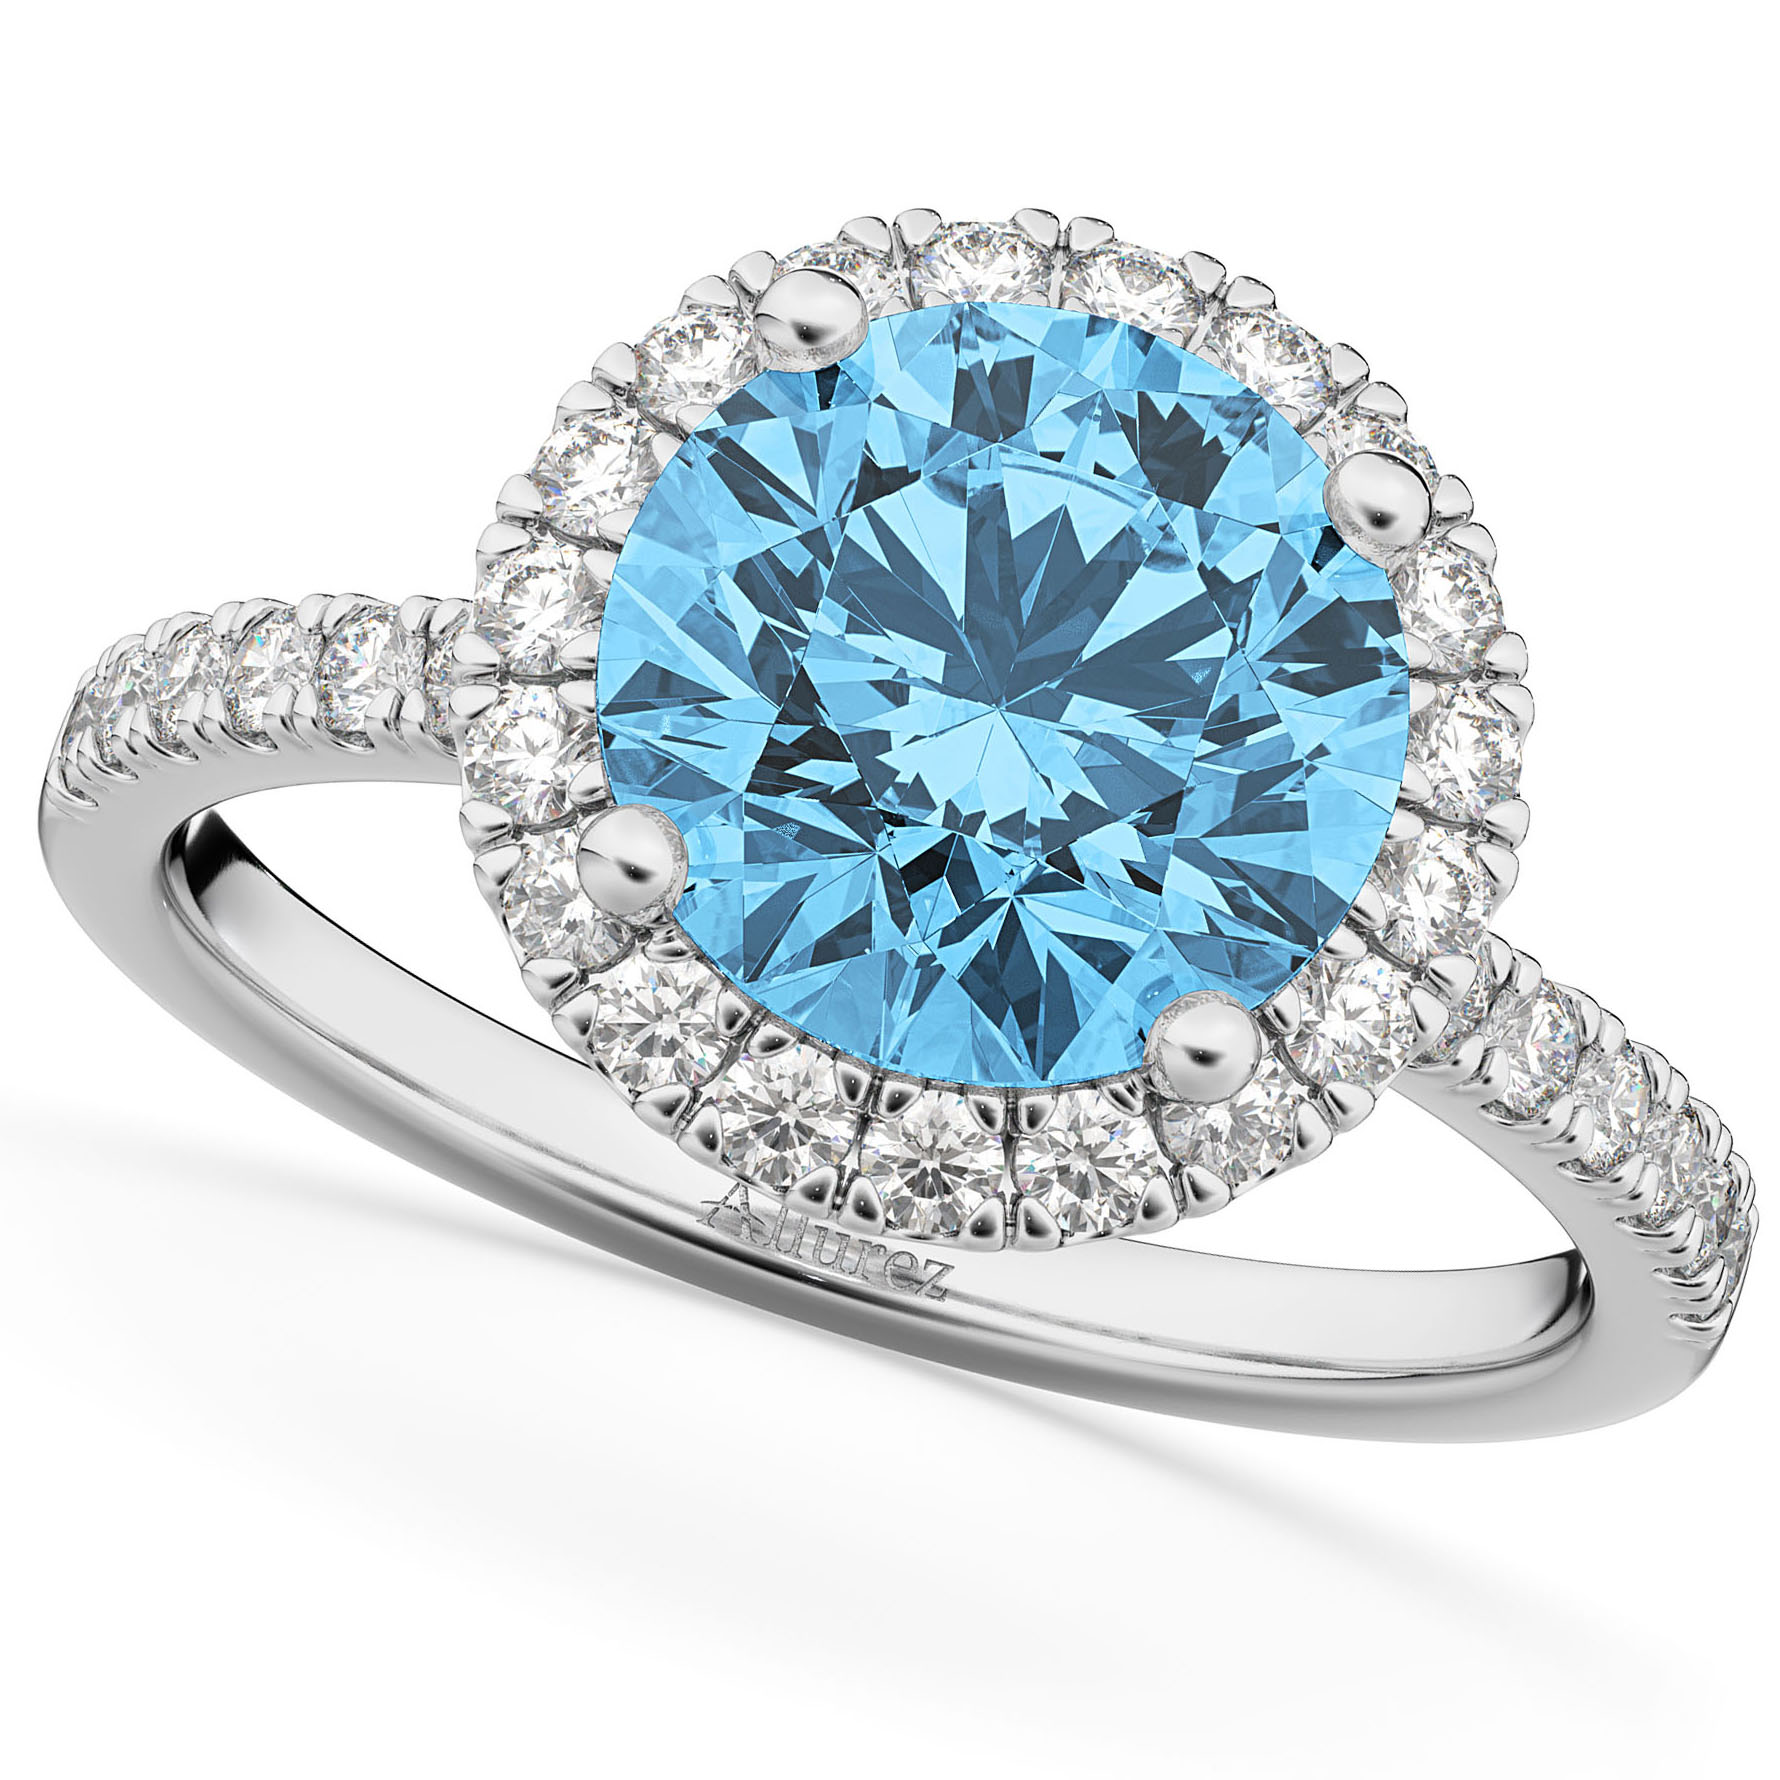 Halo Blue Topaz & Diamond Engagement Ring 14K White Gold 3.00ct